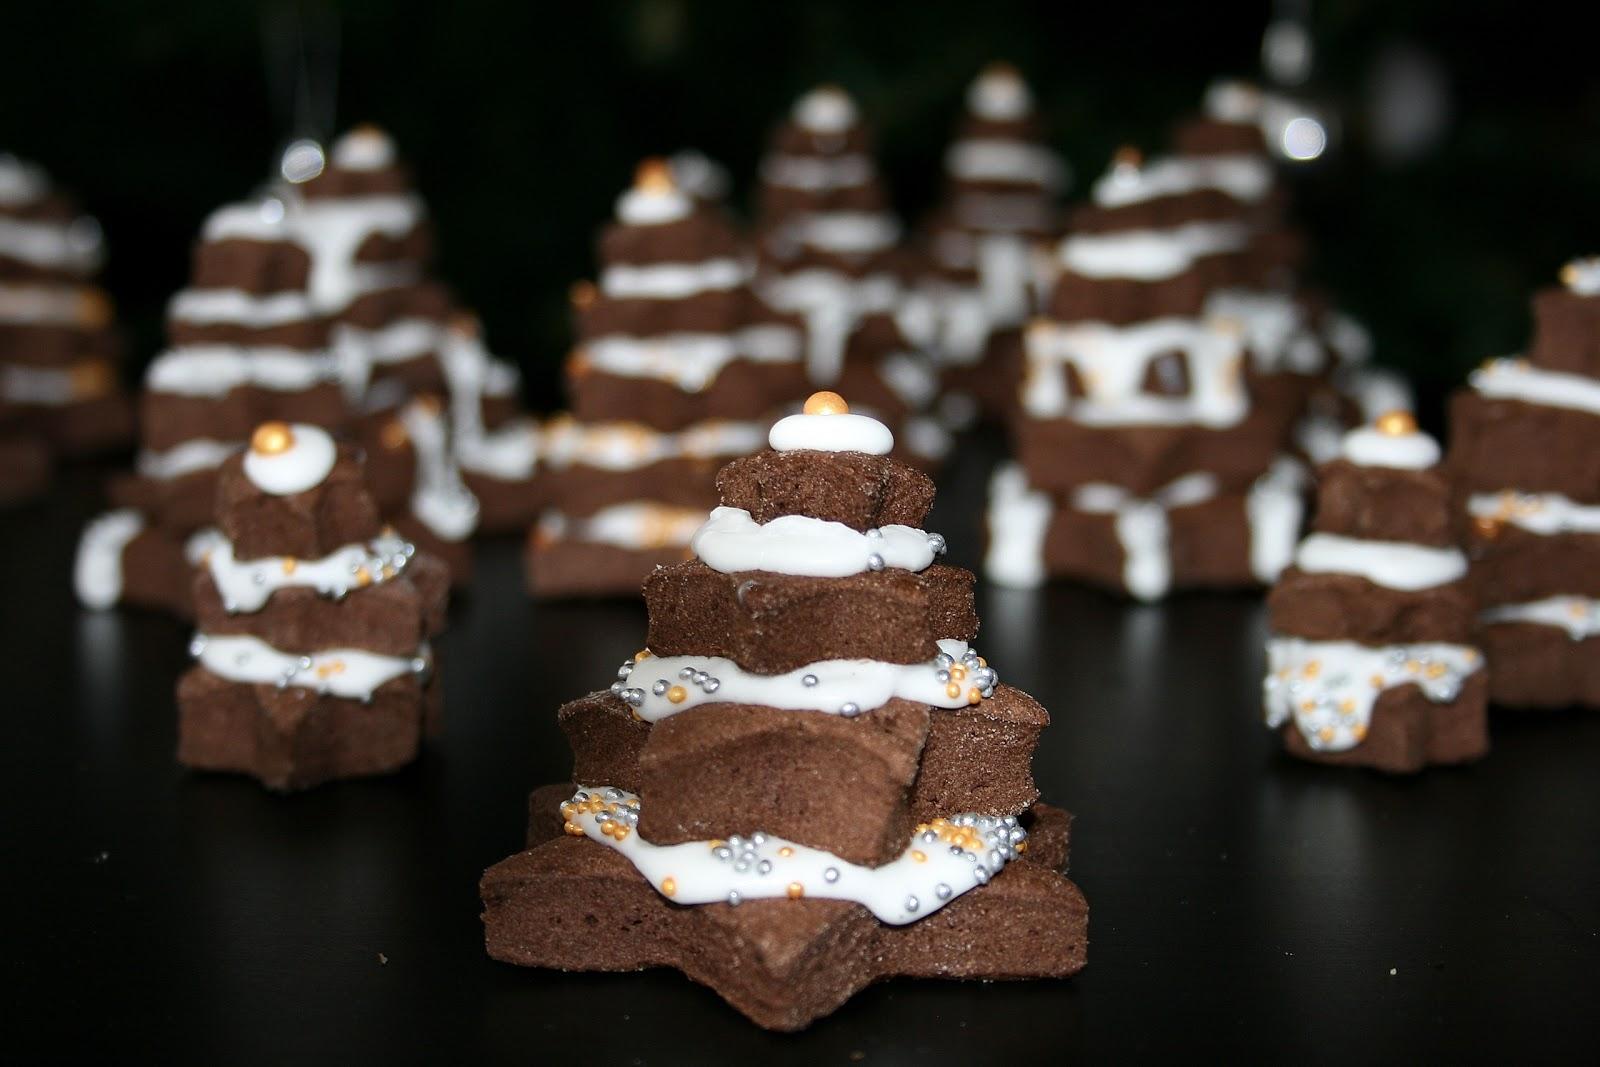 Ciasteczka kakaowe lukrowane – choinki